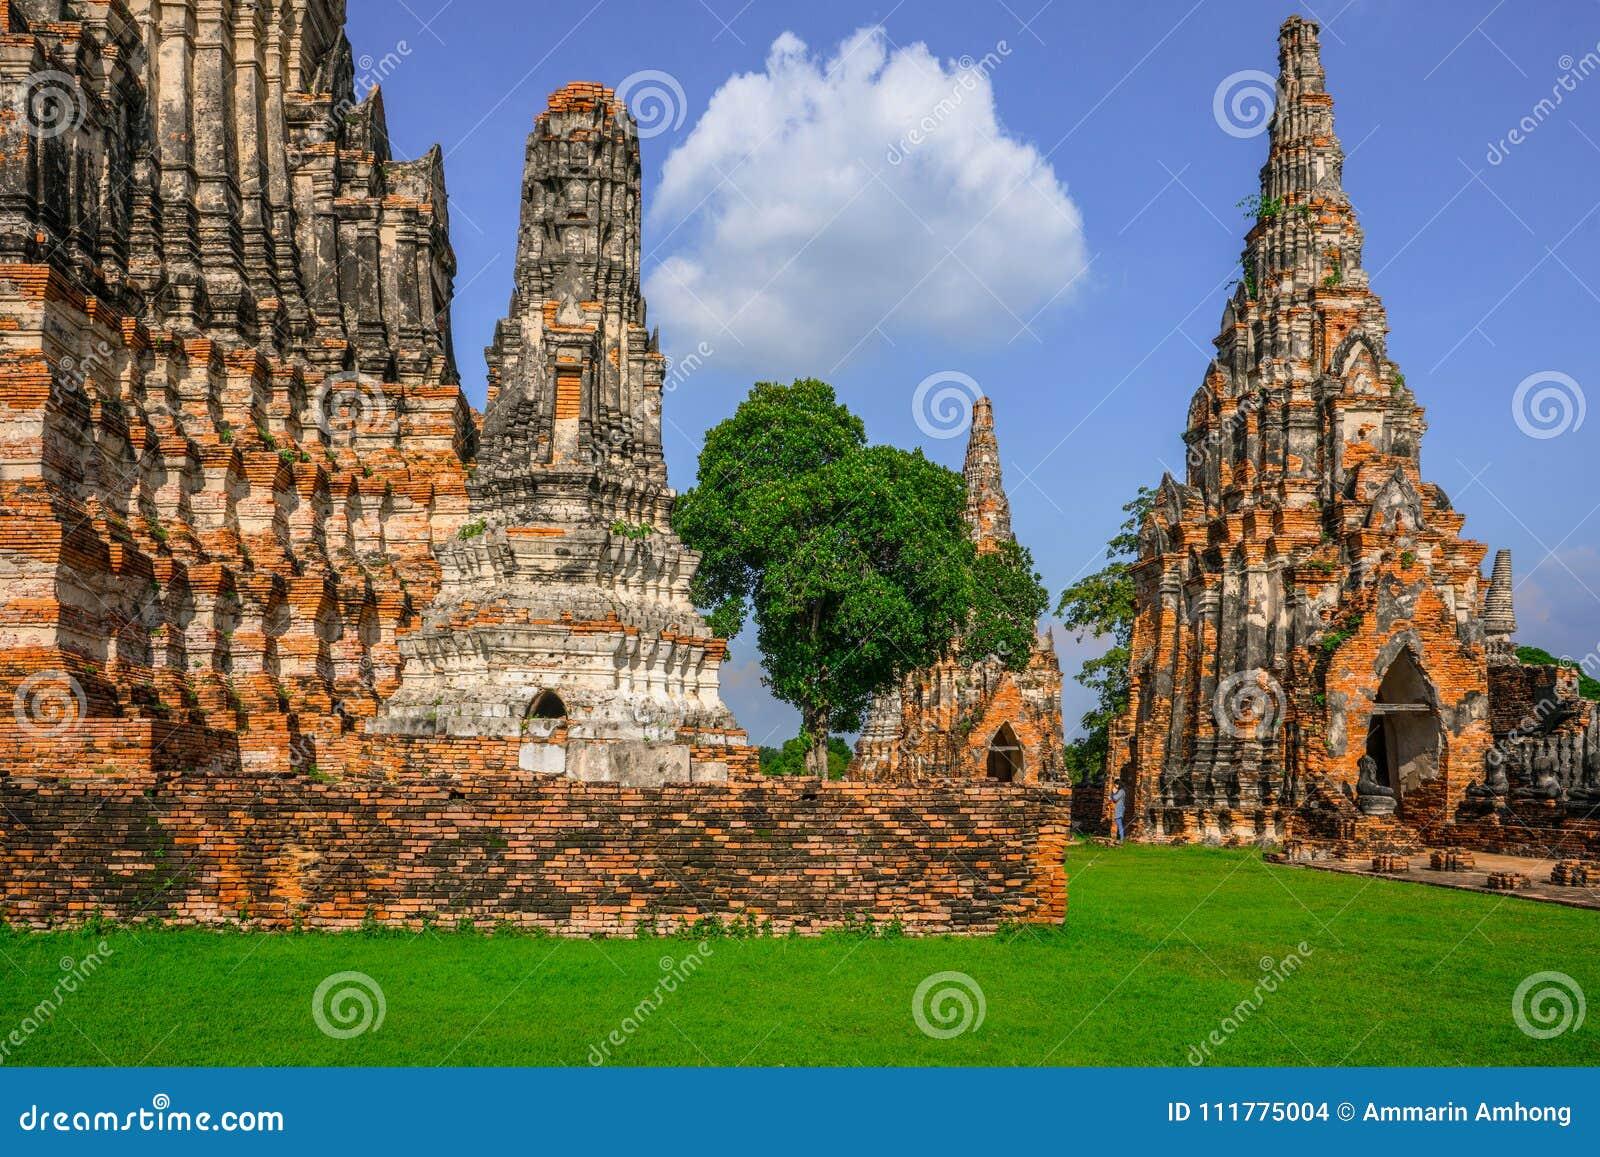 Worship of Thailand, Buddha statue, History of Thailand